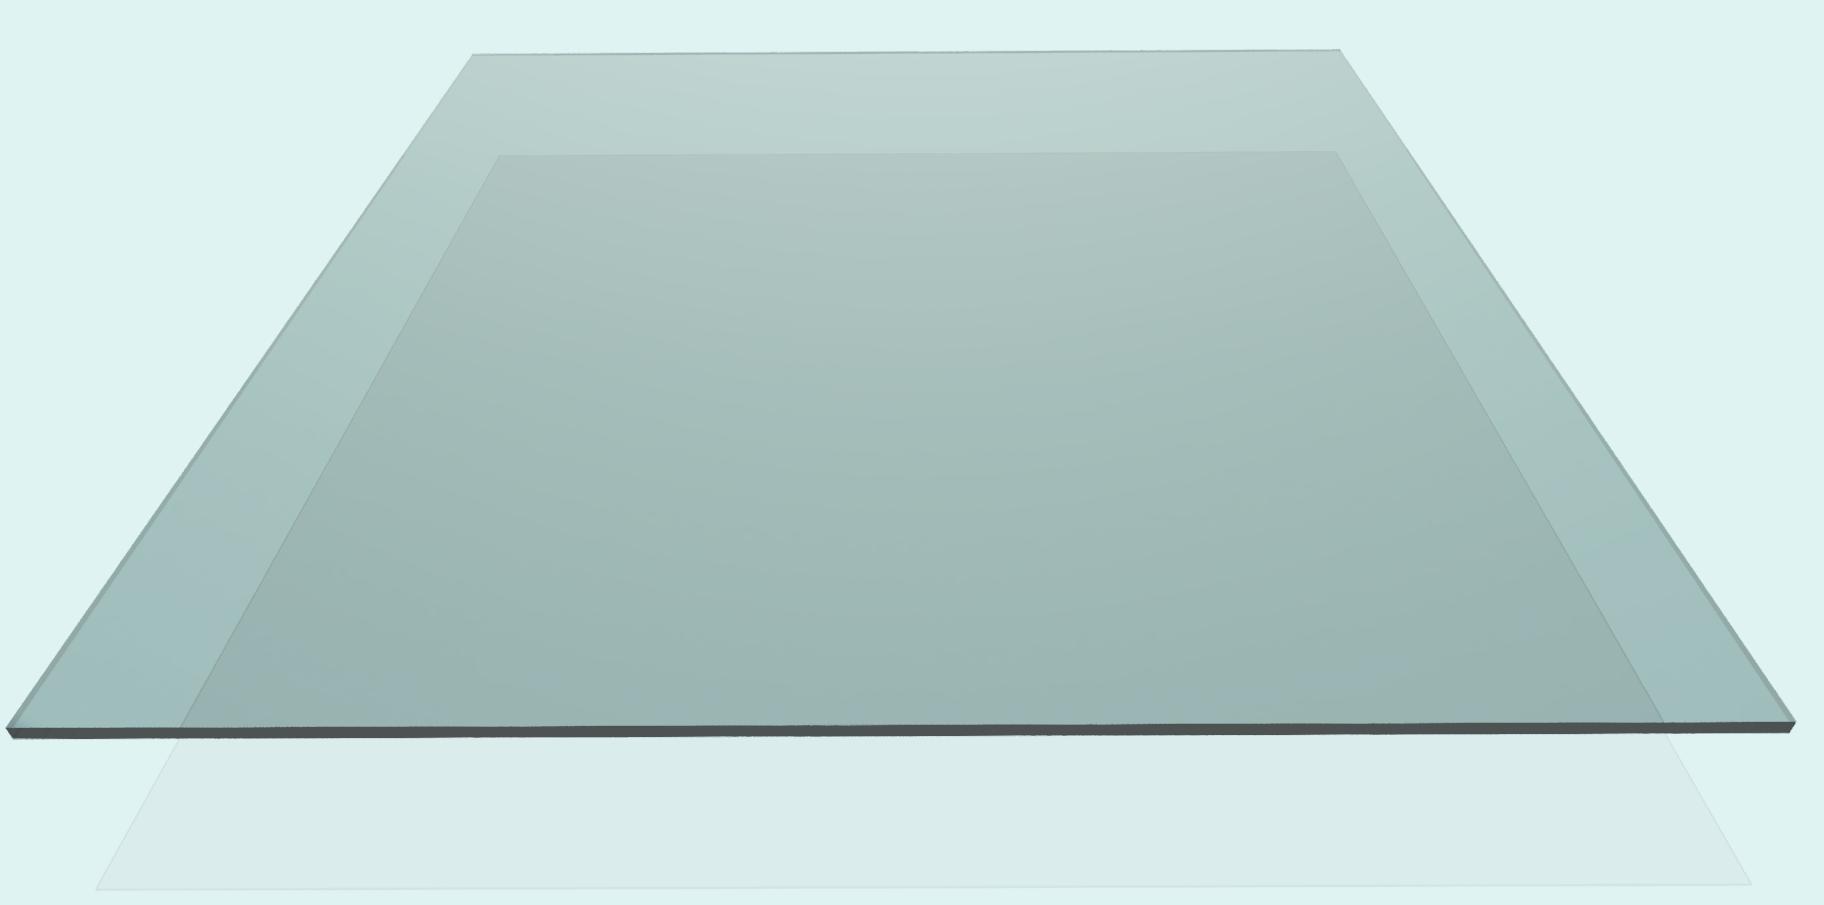 Polycarbonat 2 mm, klar